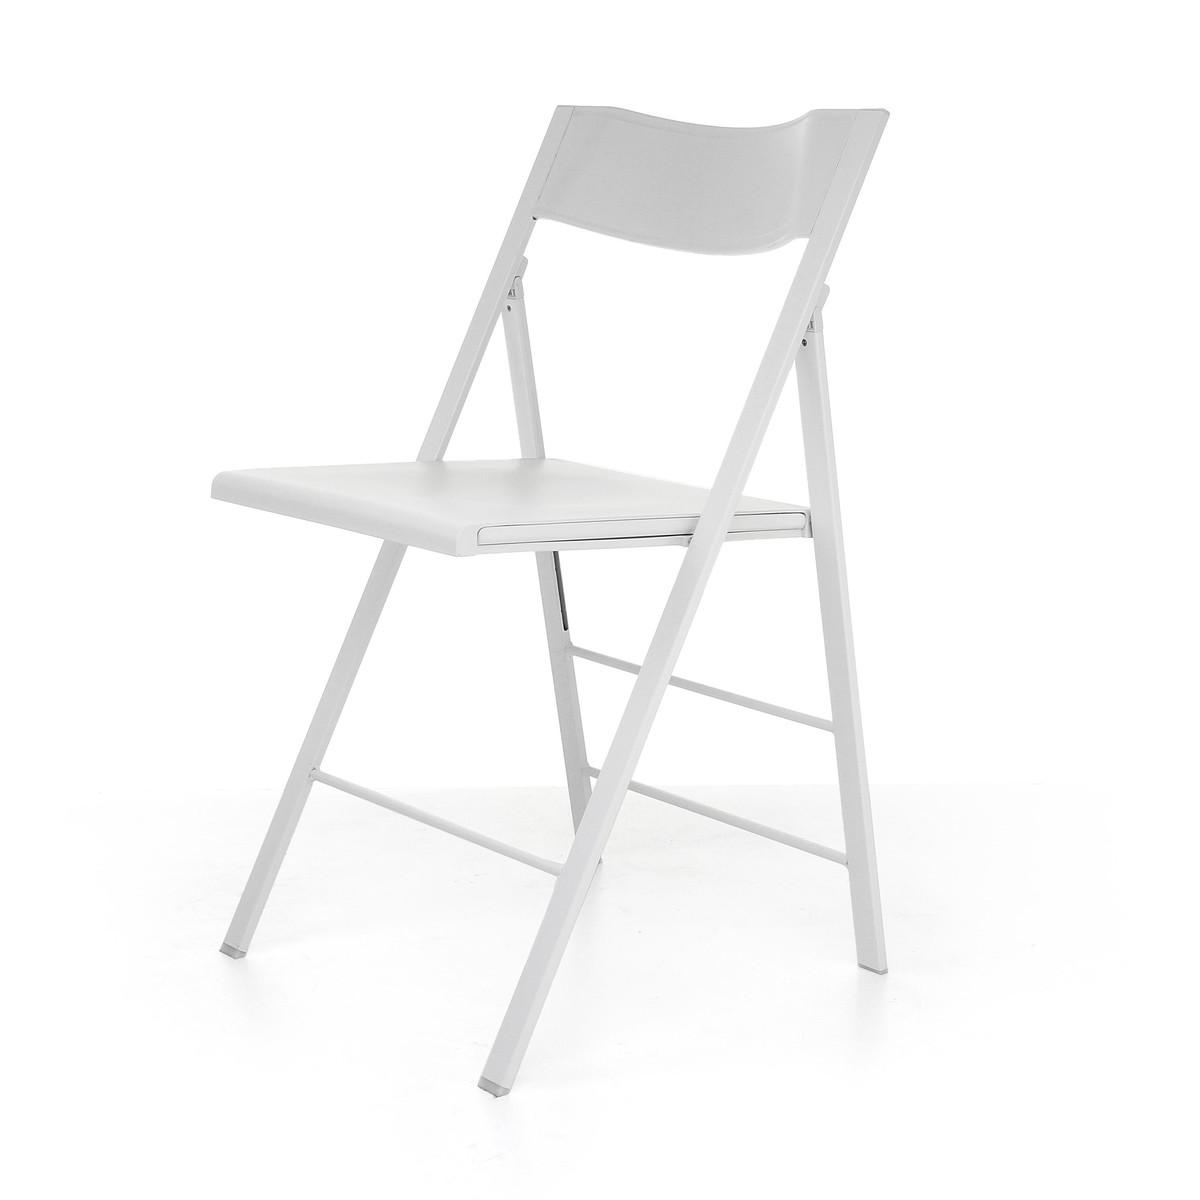 Pocket chaise pliante jan kurtz - Chaise pliante solide ...